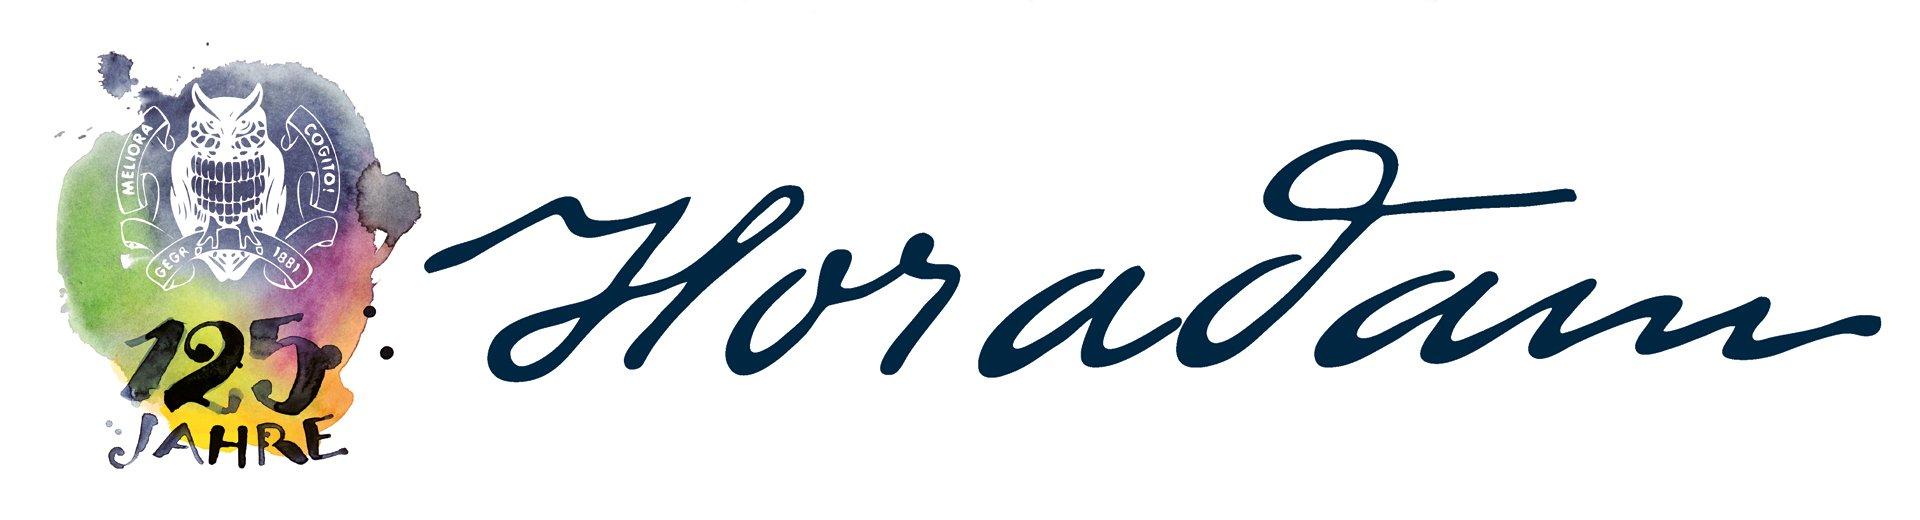 Logo HORADAM 125 Jahre Kopfbild